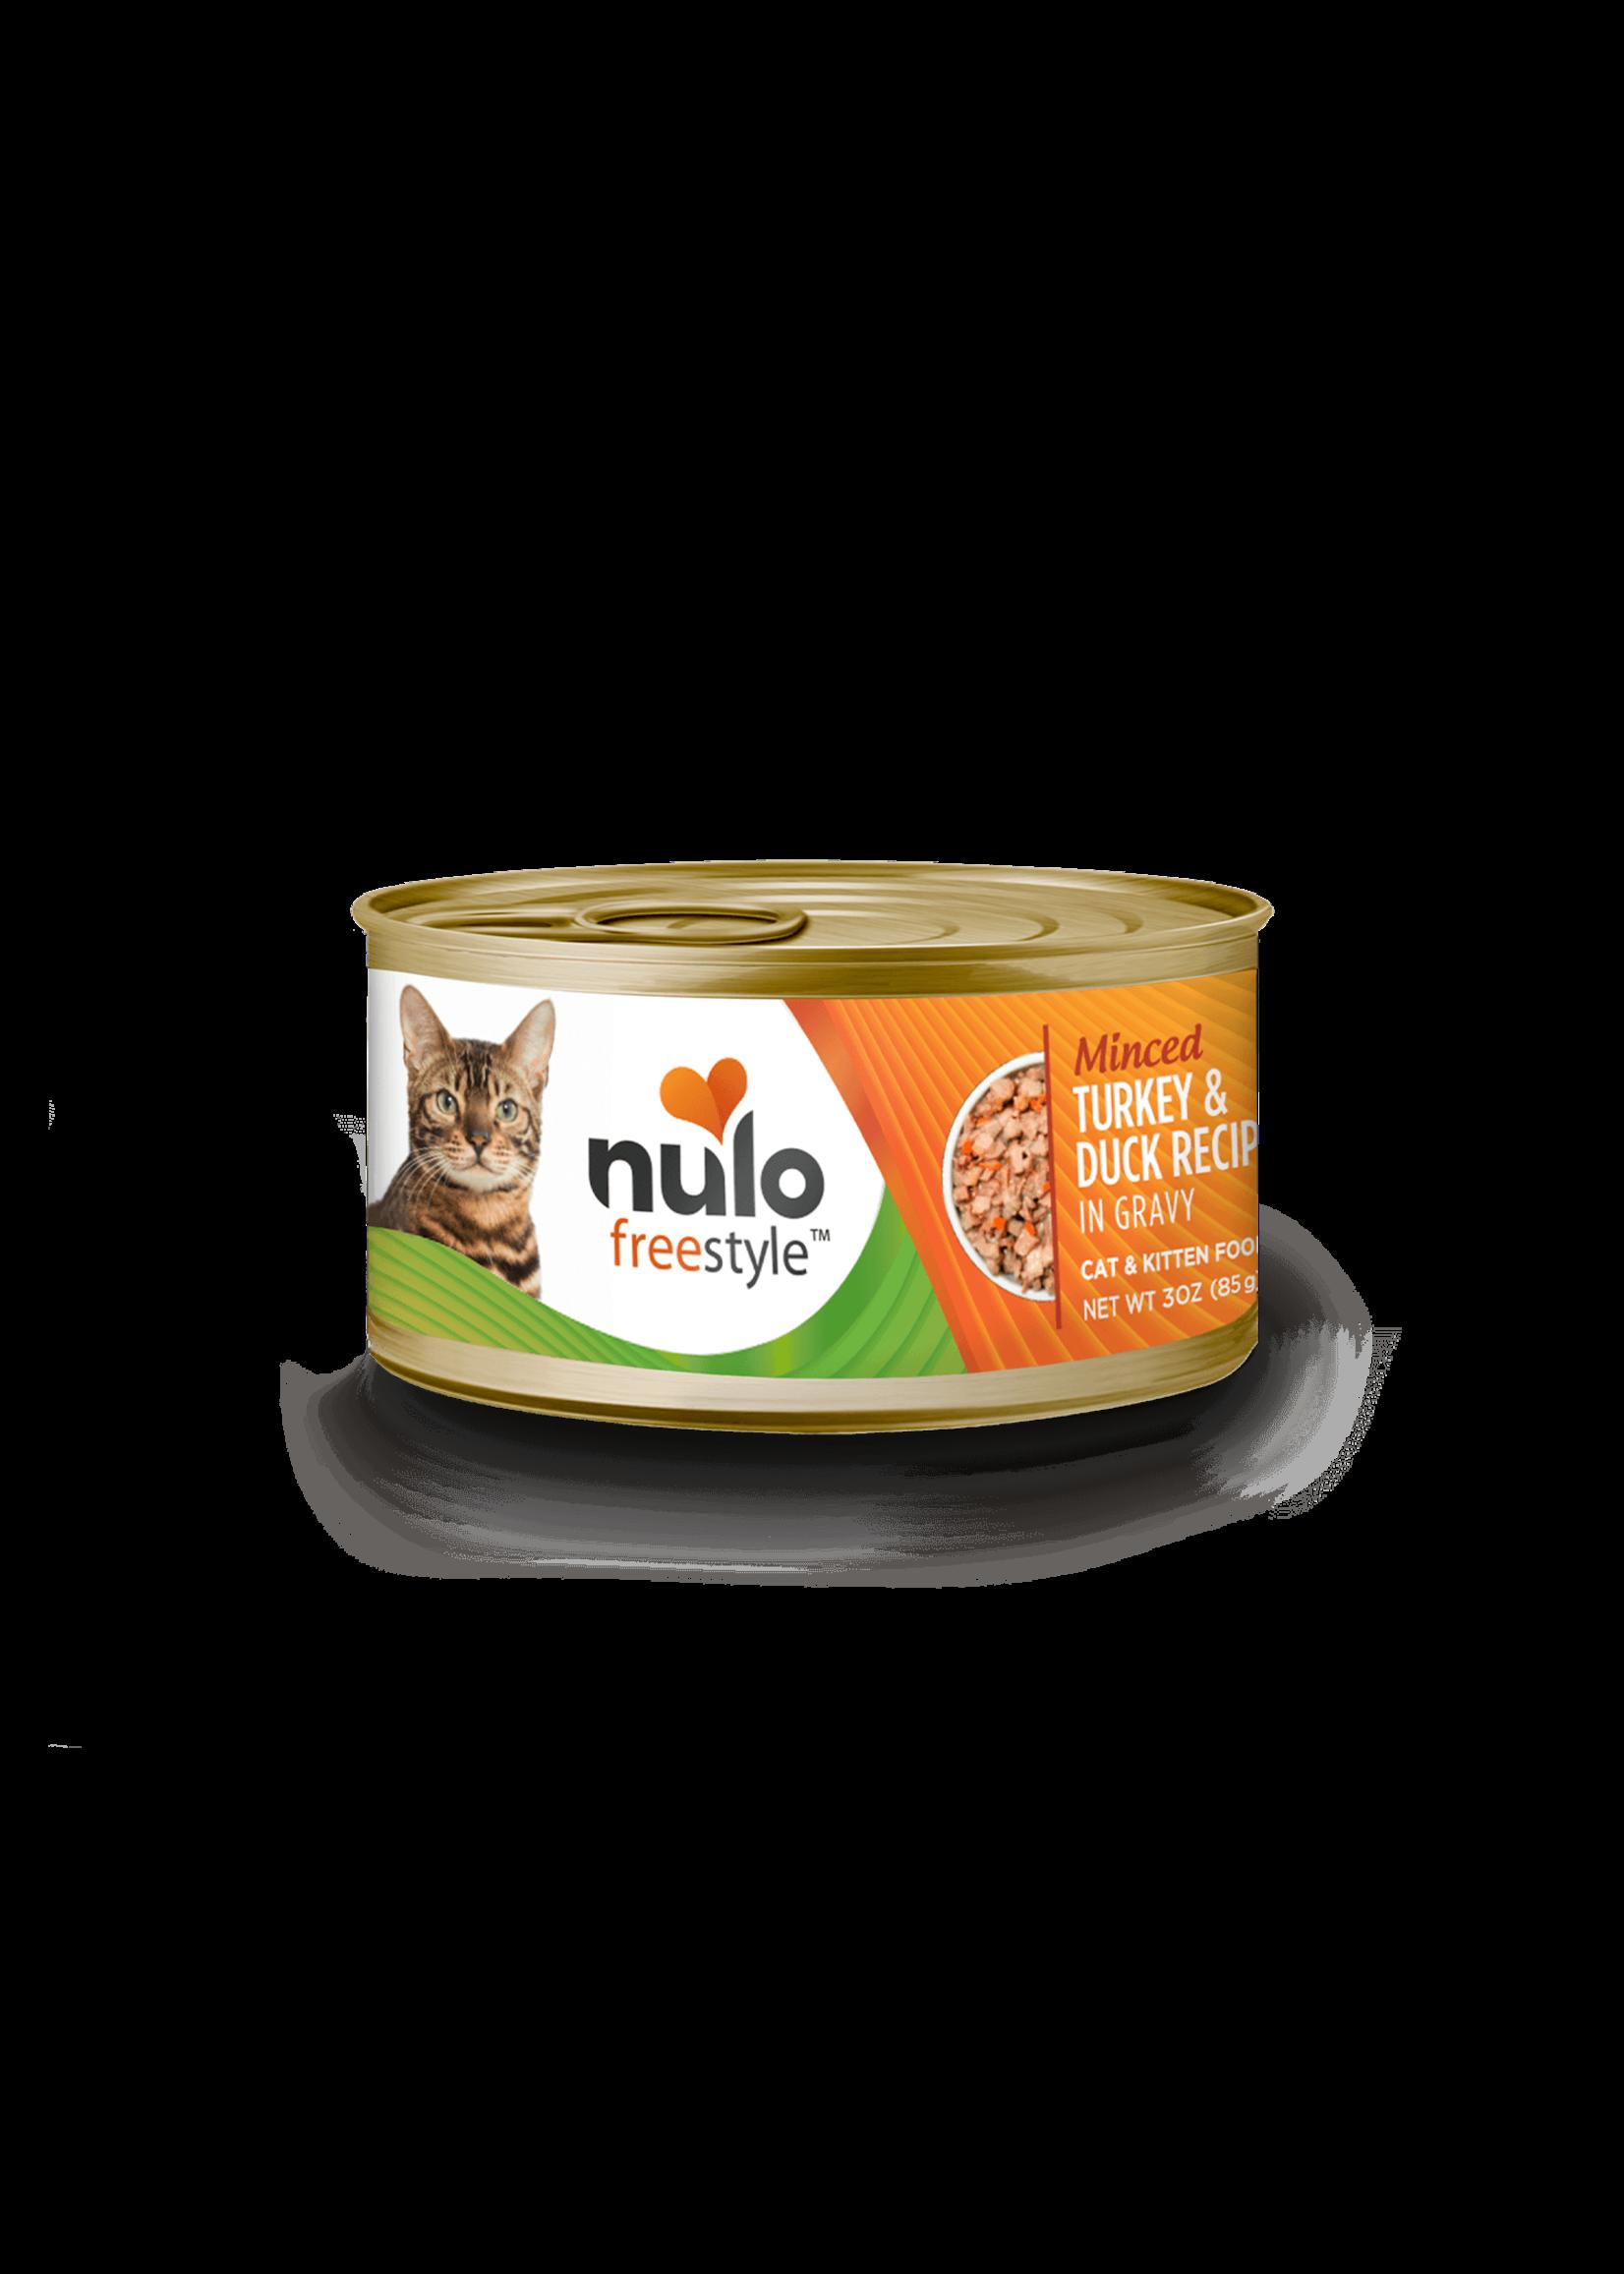 Nulo Nulo FreeStyle Grain Free Cat Food Minced Turkey & Duck in Gravy, 3oz Can